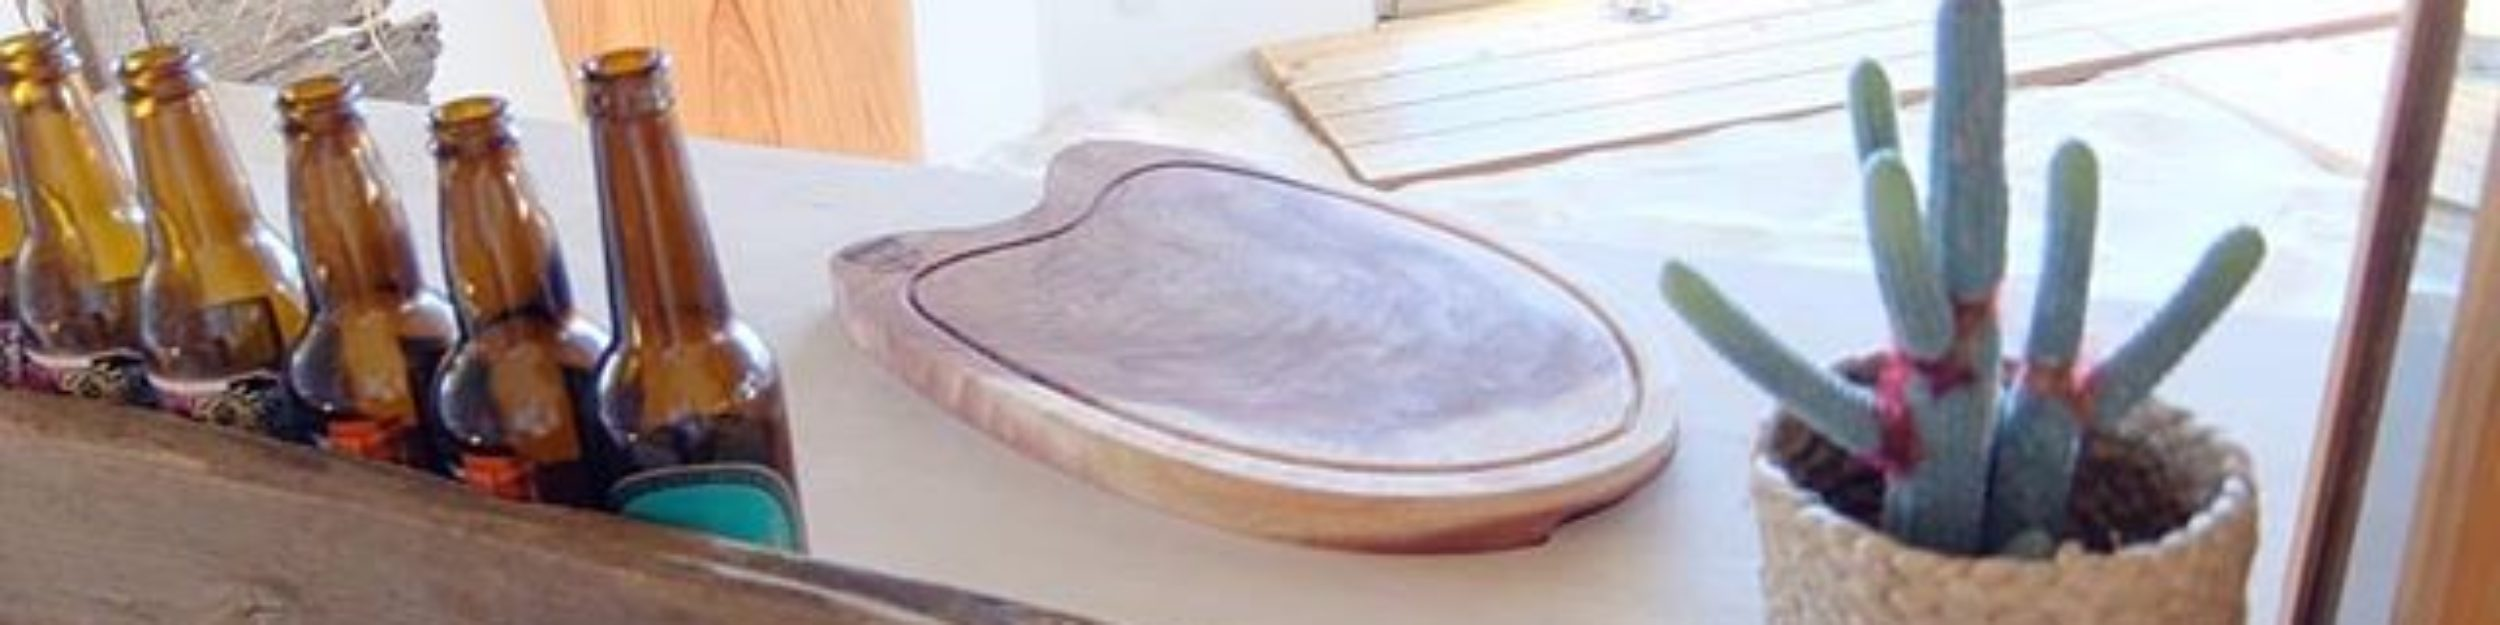 WoodBoard KUKU レジャー・インテリア・ディスプレイ用木製サーフボード